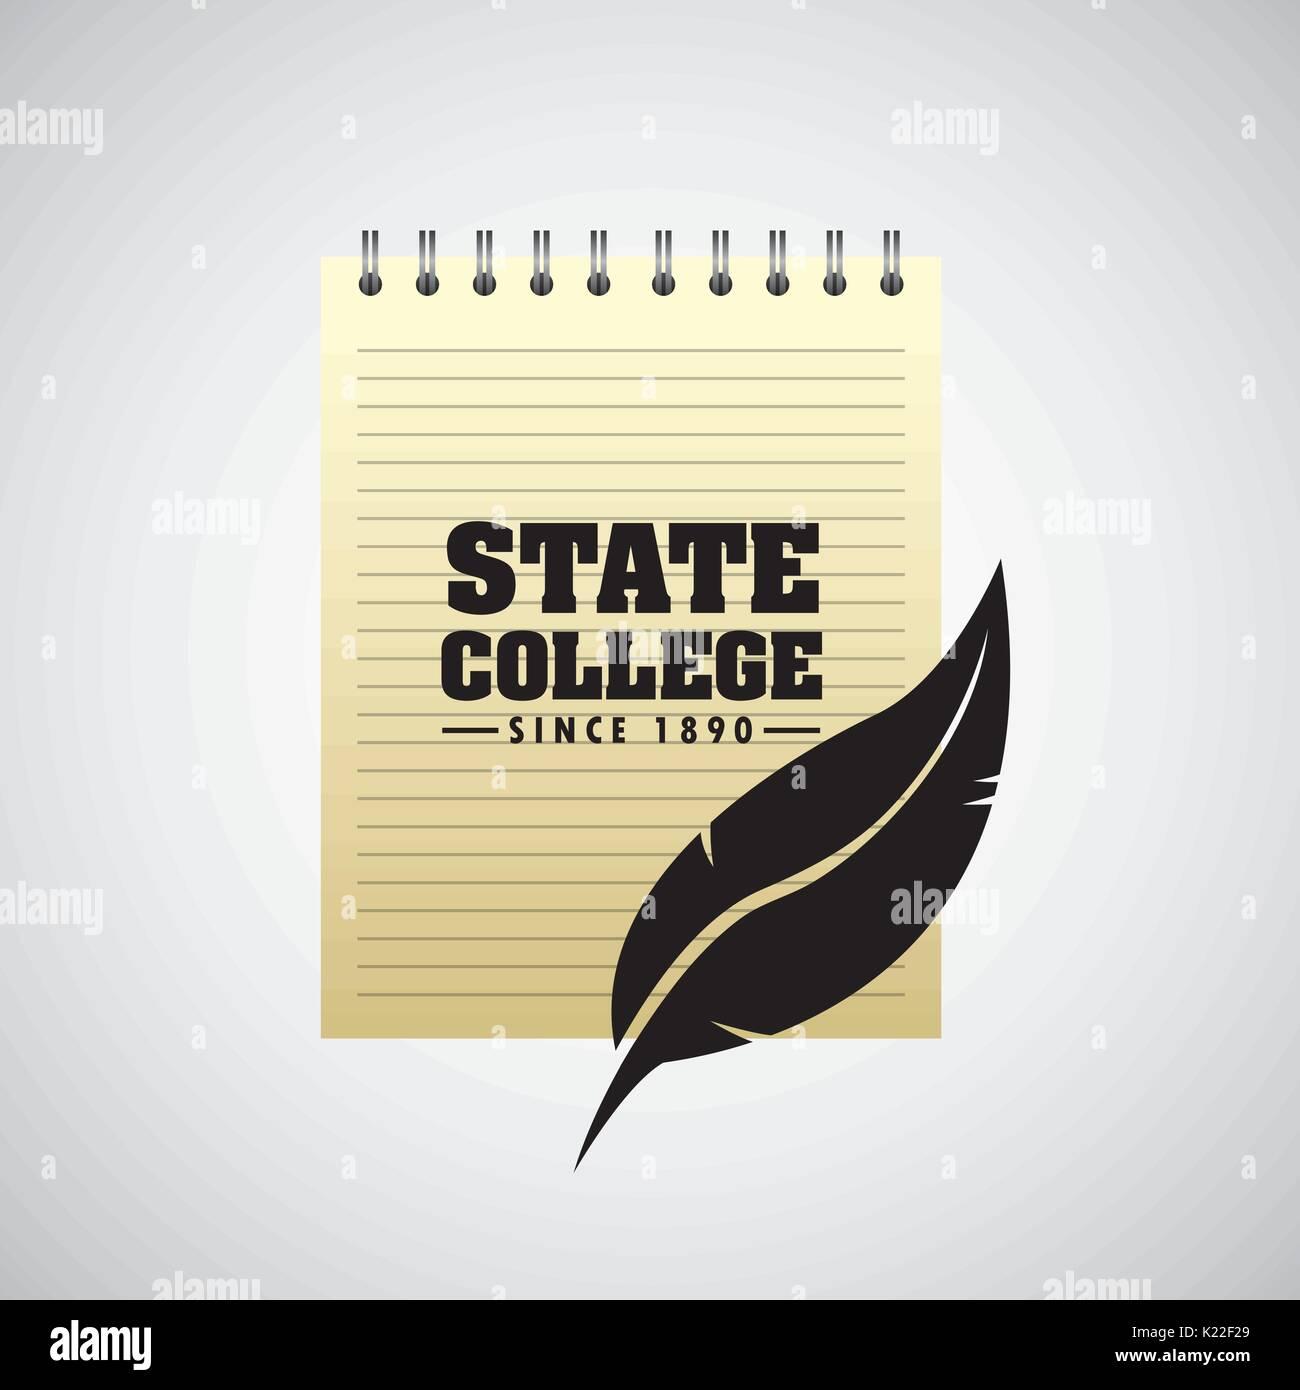 staten college  design  - Stock Image